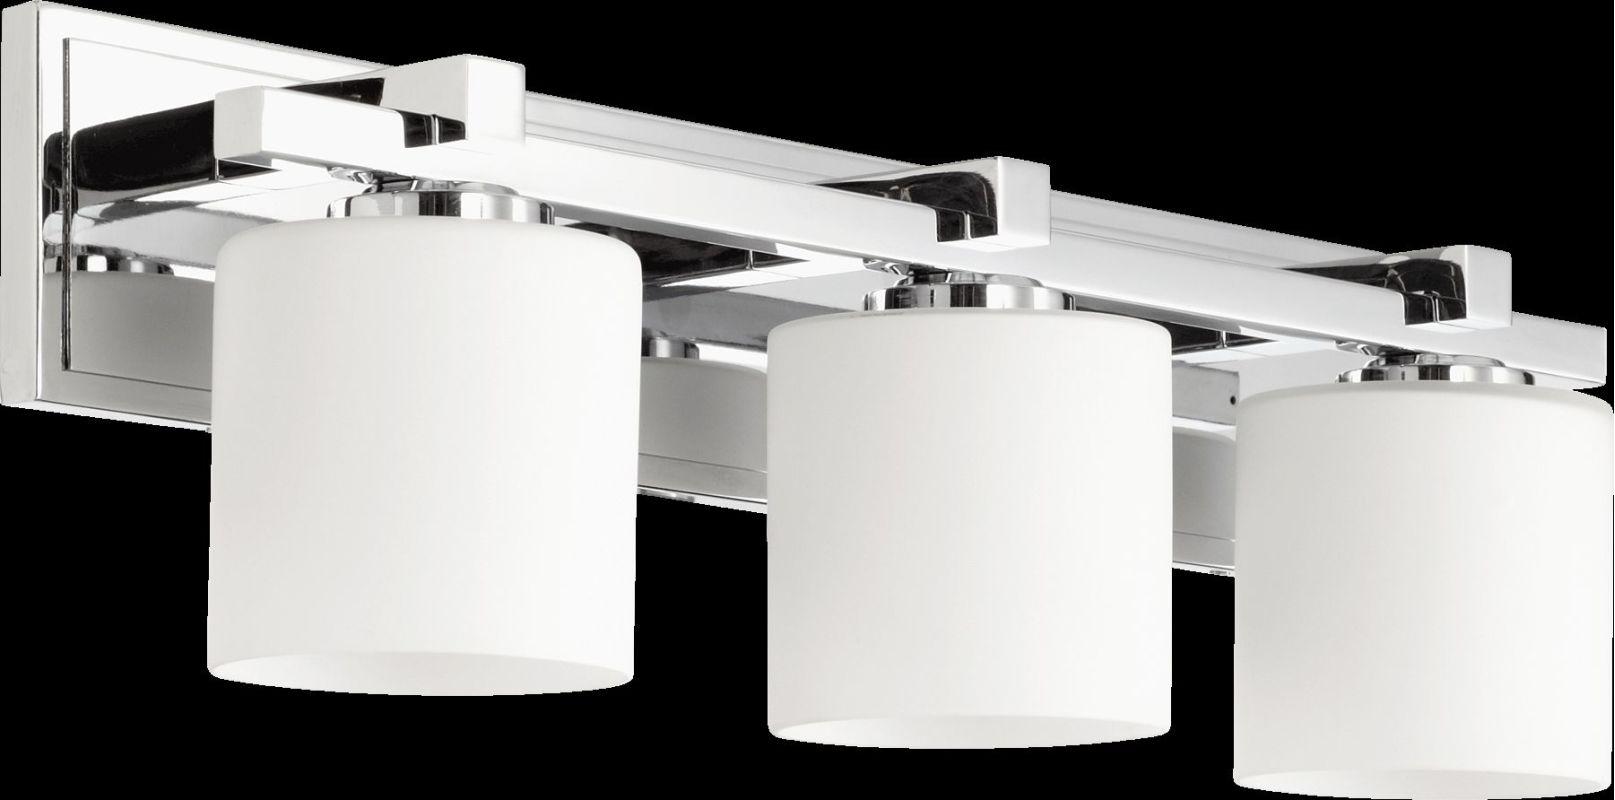 Shop Progress Lighting 3 Light Archie Chrome Bathroom: Quorum International 5369-3-14 Chrome 3 Light Bathroom